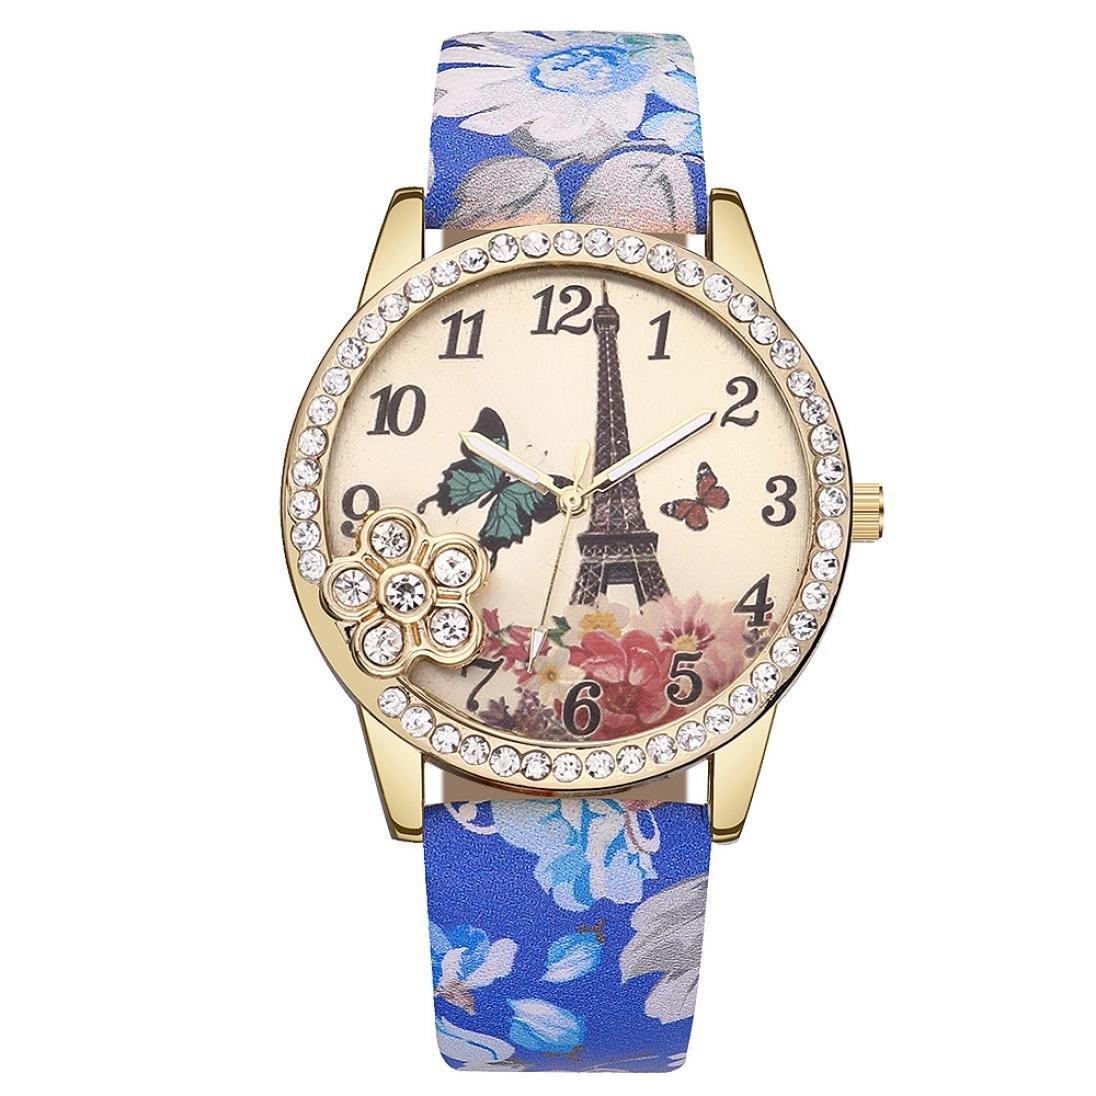 Wrist Watches for Women Teen Girls, Iuhan Fashion Eiffel Tower Leather Quartz Watch Women Casual Crystal Wristwatch Charm Layer Quartz Bracelet Watch (E)